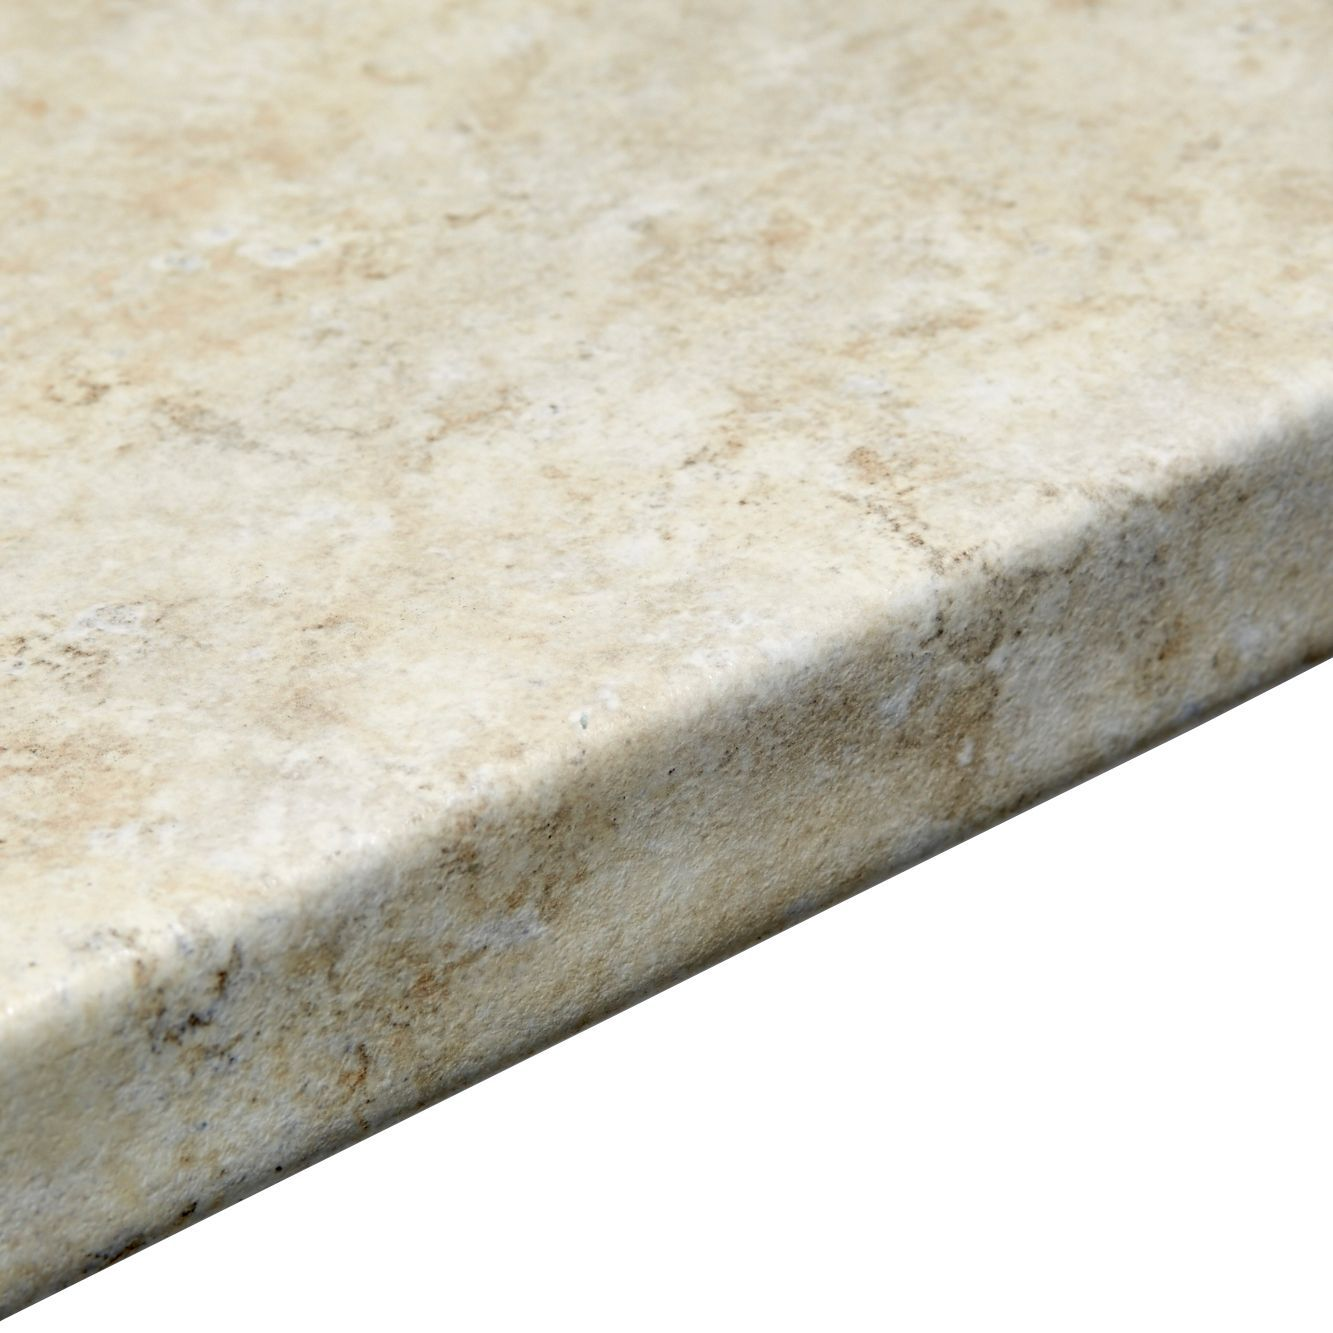 Bathroom worktops b q - 38mm Natural Stone Marble Effect Round Edge Worktop L 3000mm D 600mm Departments Diy At B Q